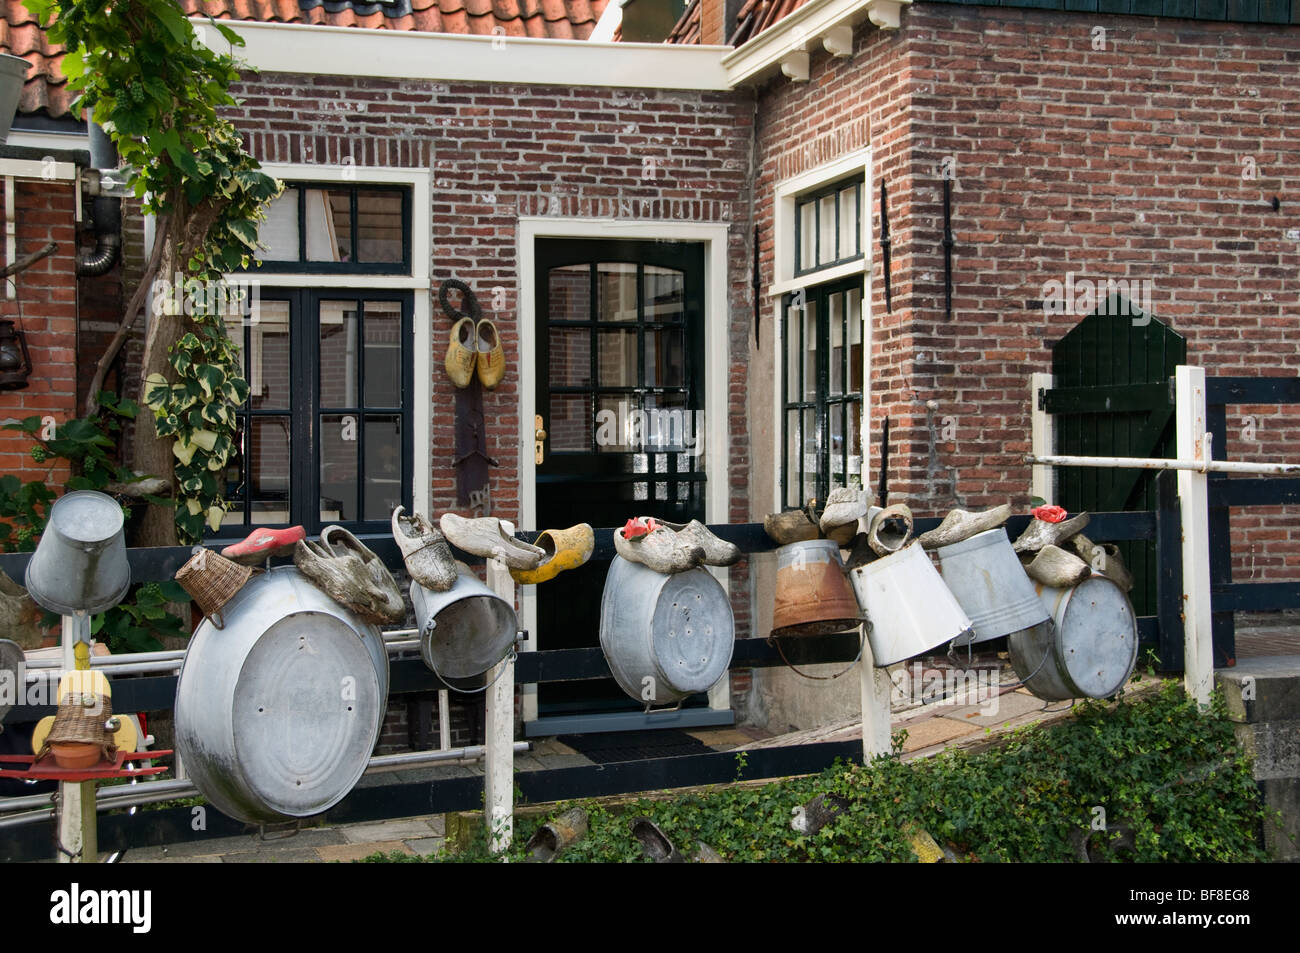 Edam Netherlands North Holland historic town - Stock Image